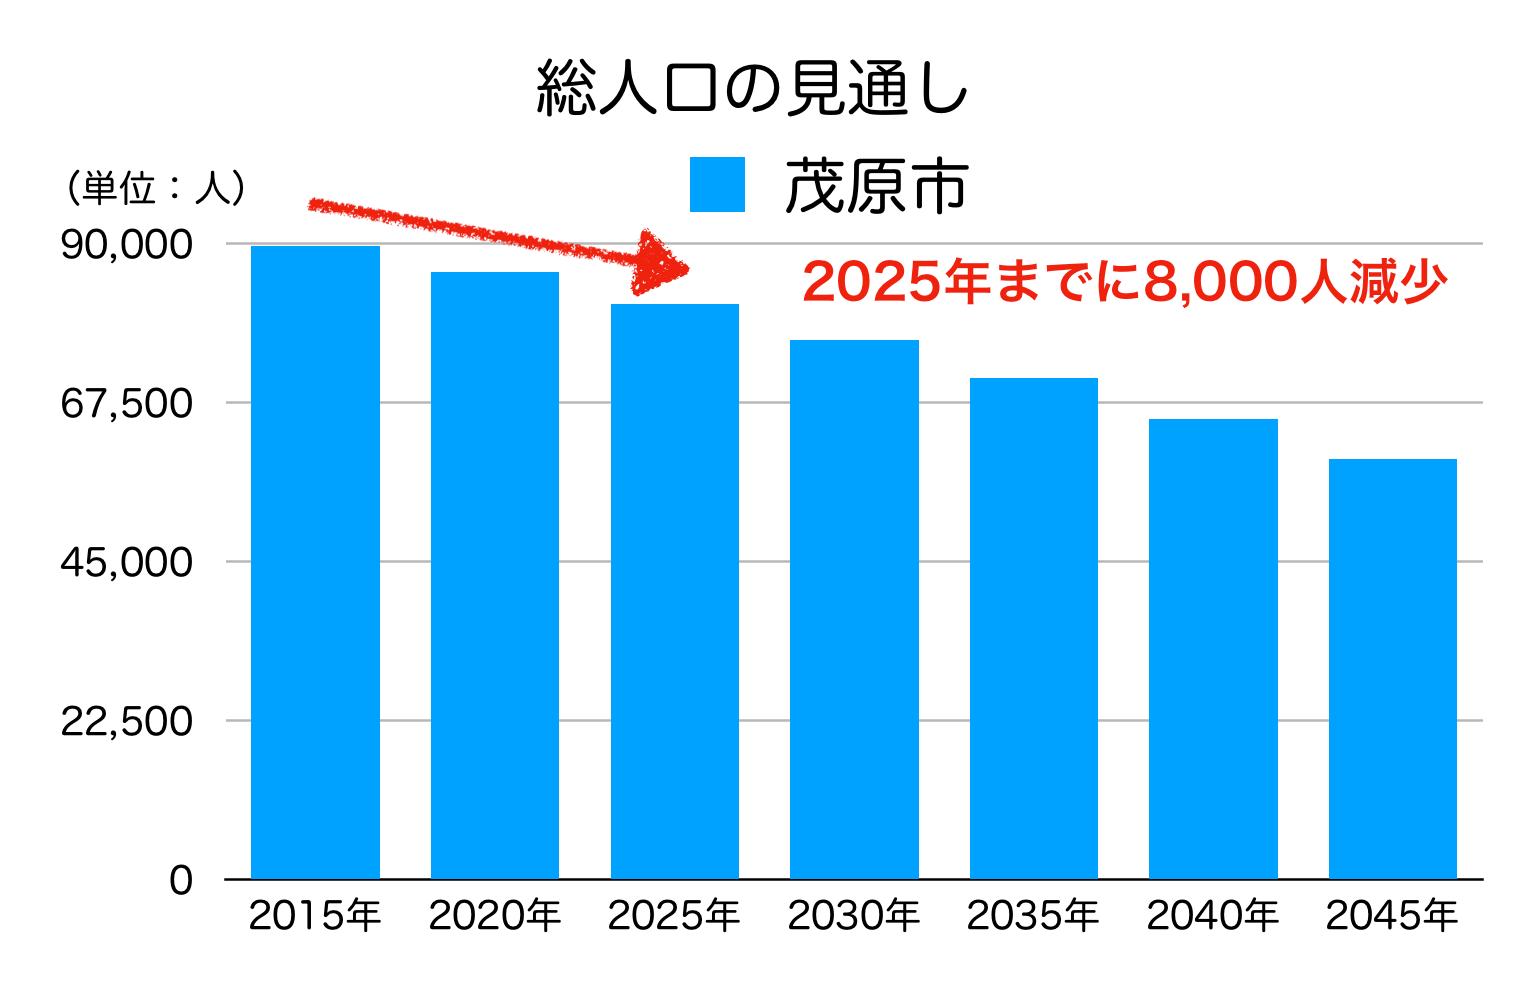 茂原市の人口予測